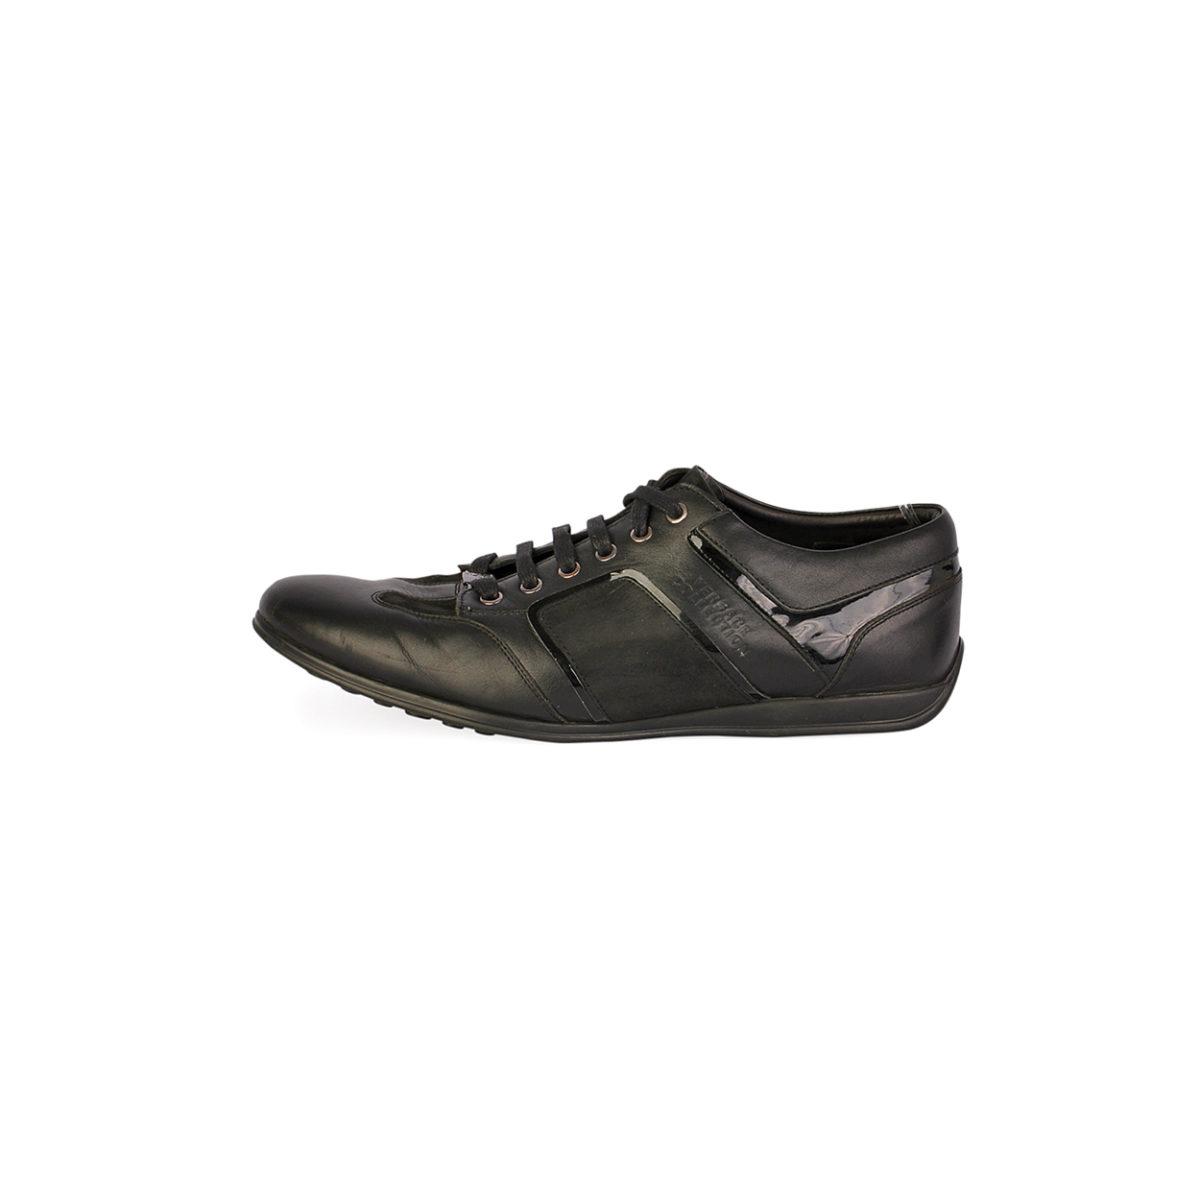 4ca6cd60 VERSACE Collections Men's Embossed Leather Top Sneakers Black - S: 44 (9.5)